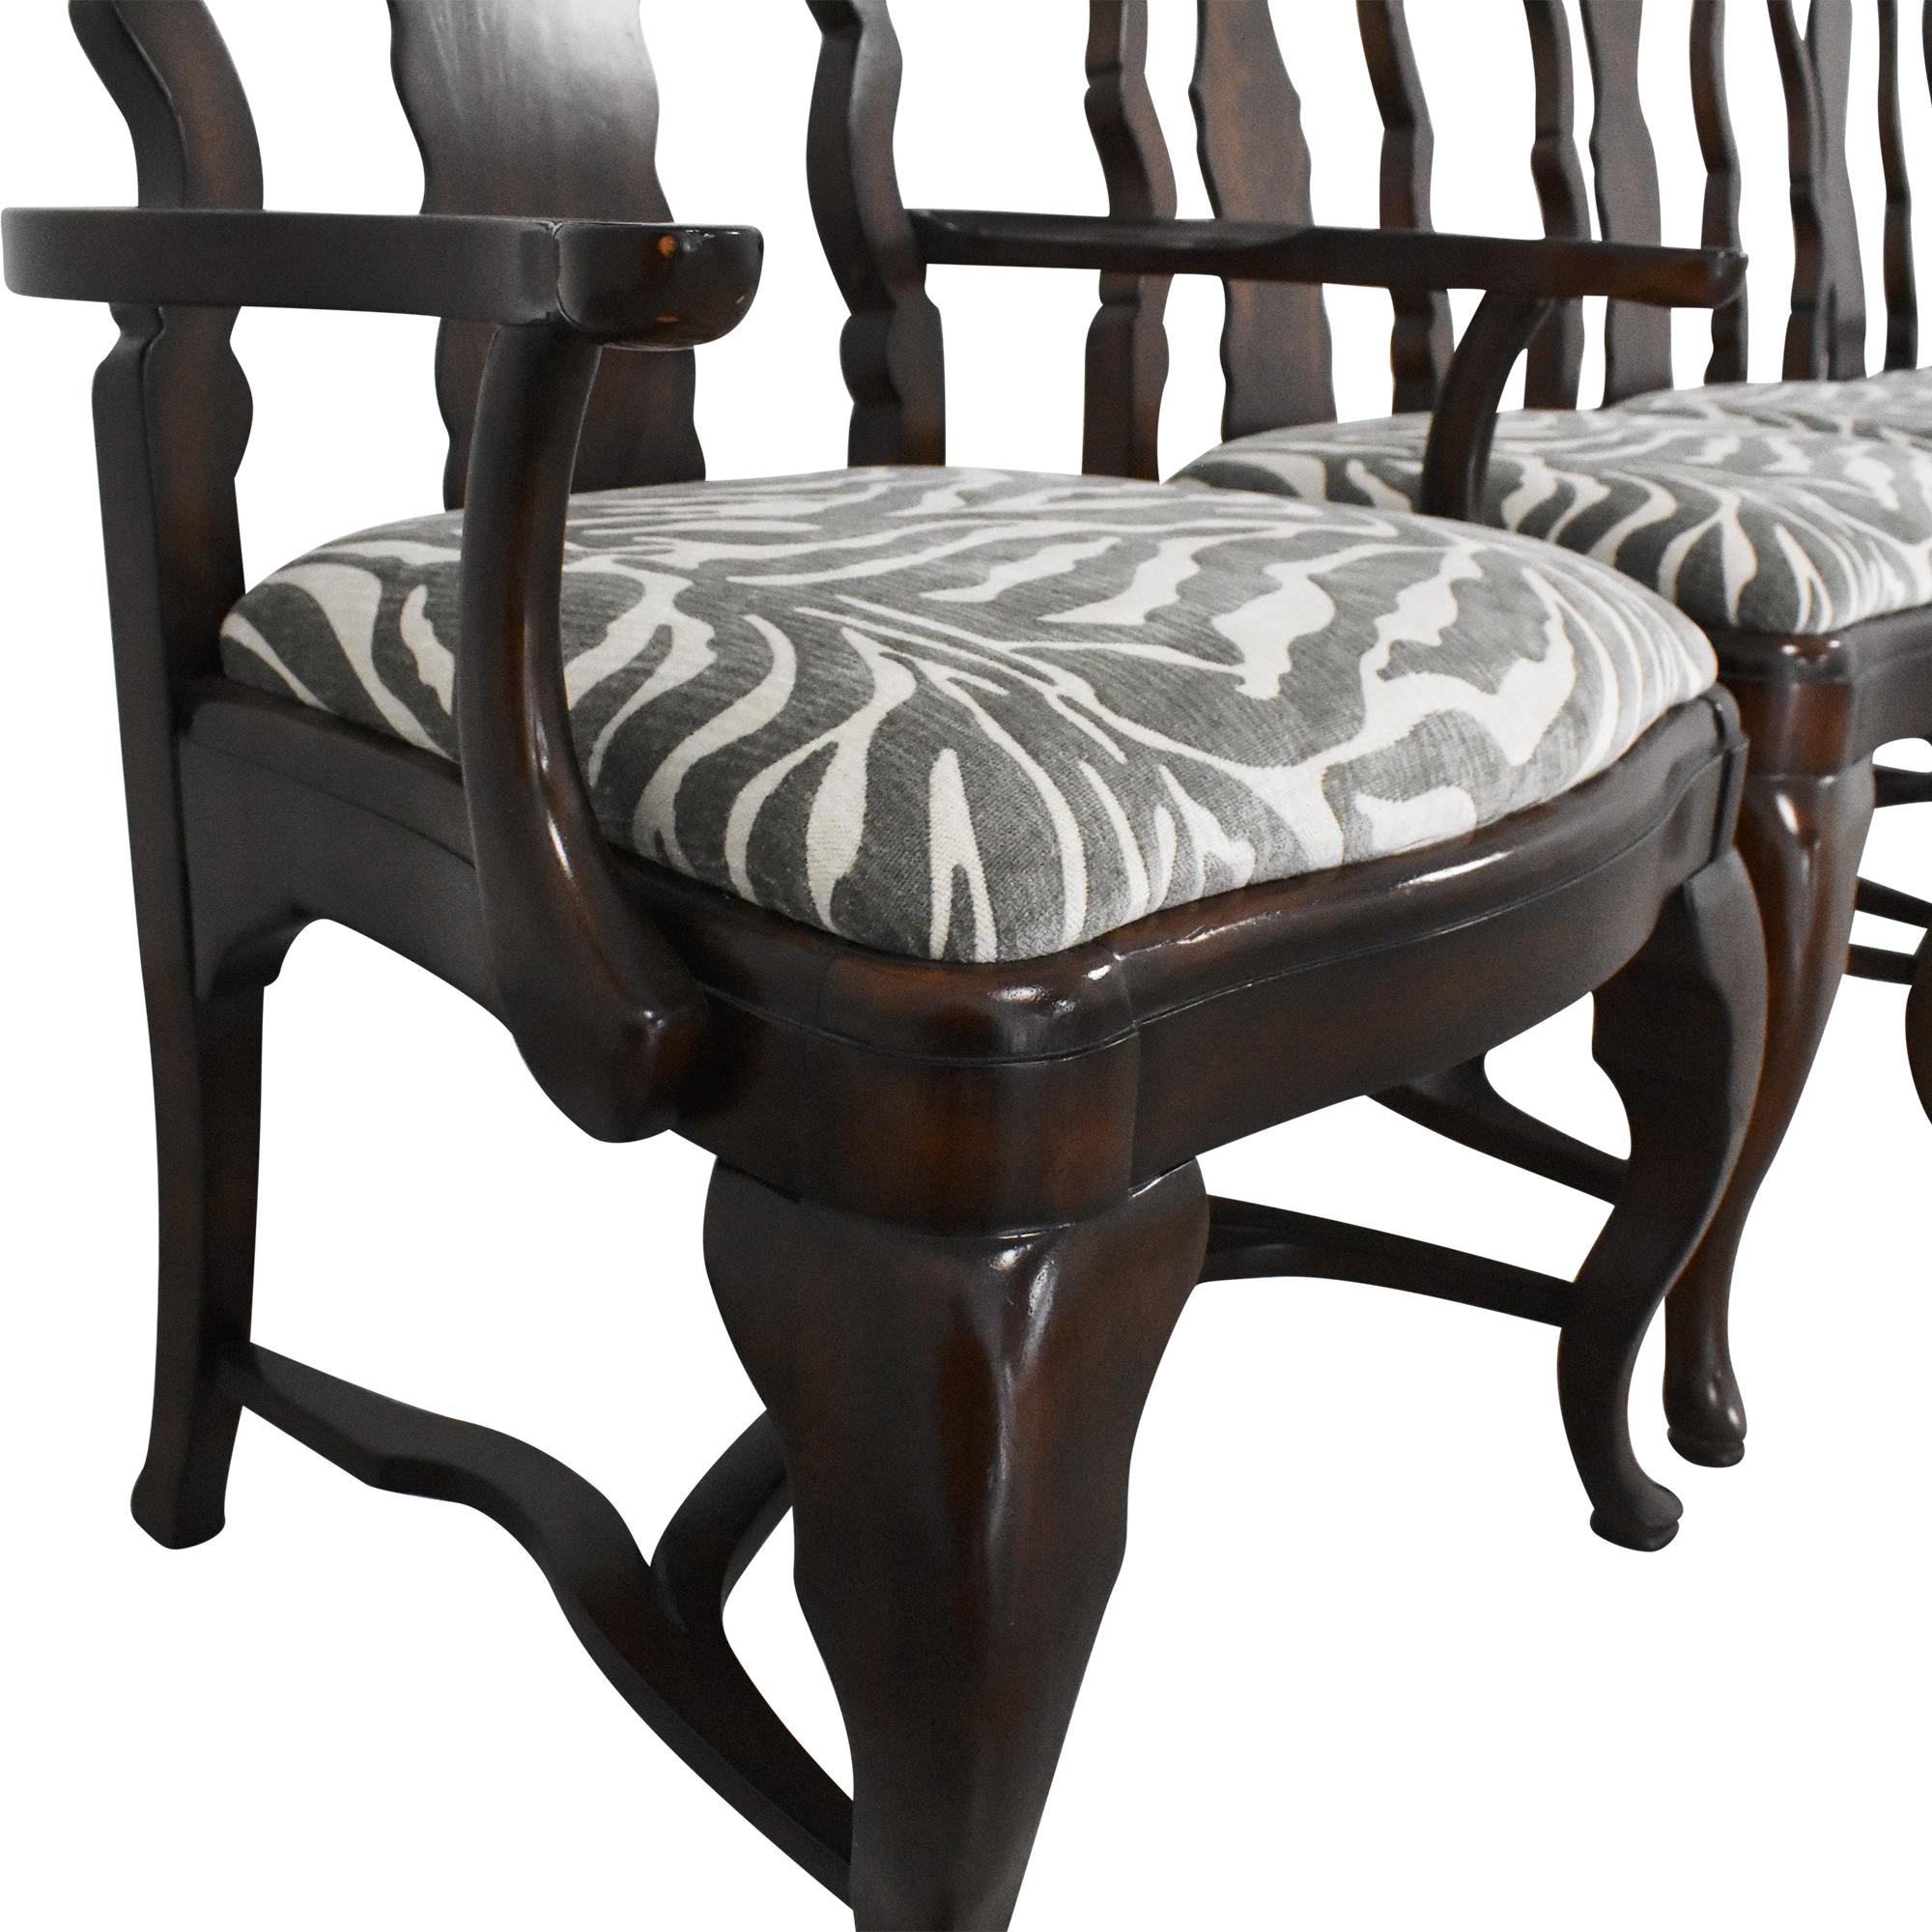 Bernhardt Bernhardt Upholstered Dining Chairs pa